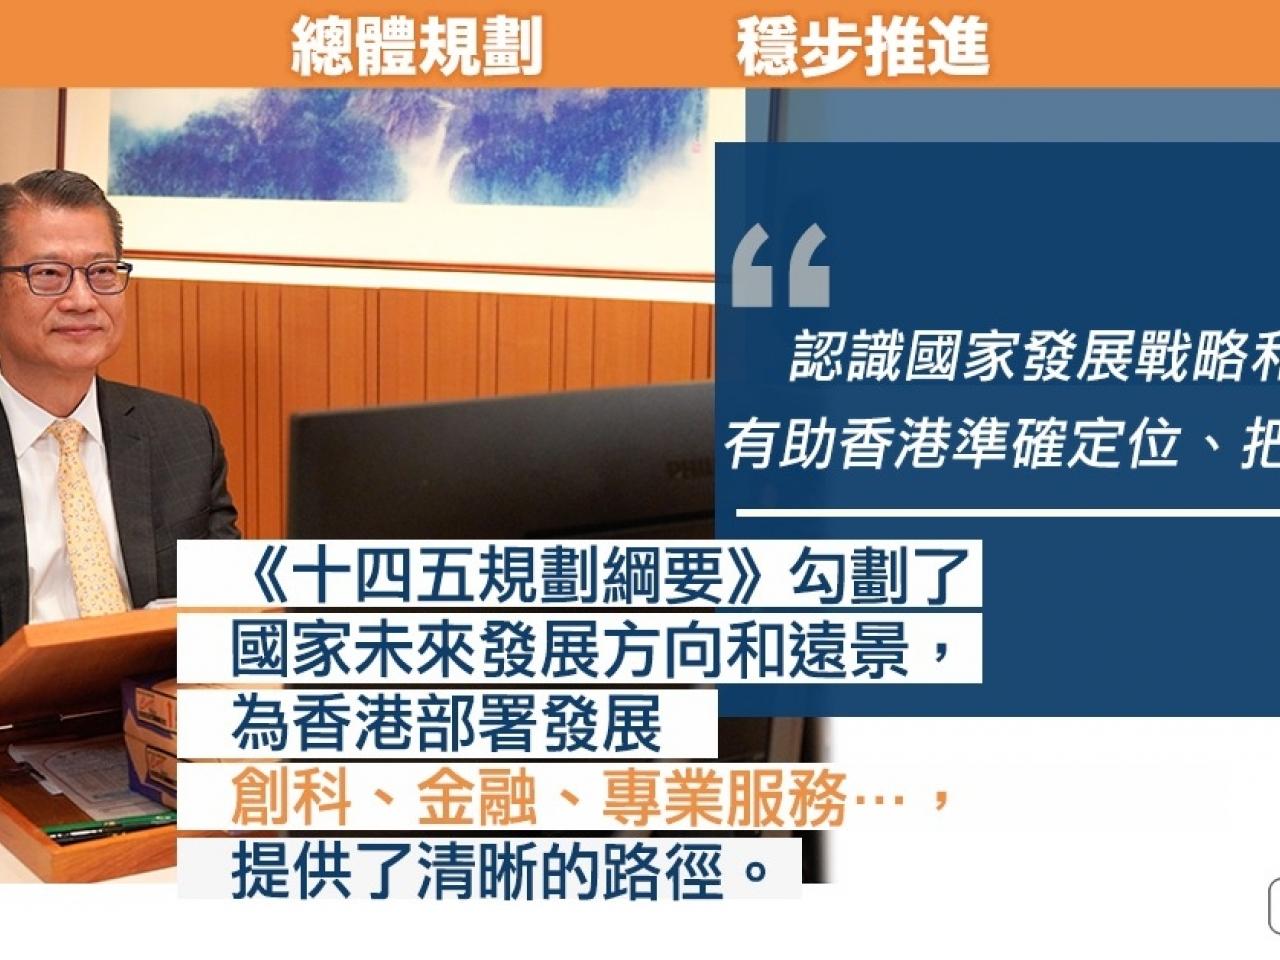 Hong Kong's economy is bouncing back: Paul Chan